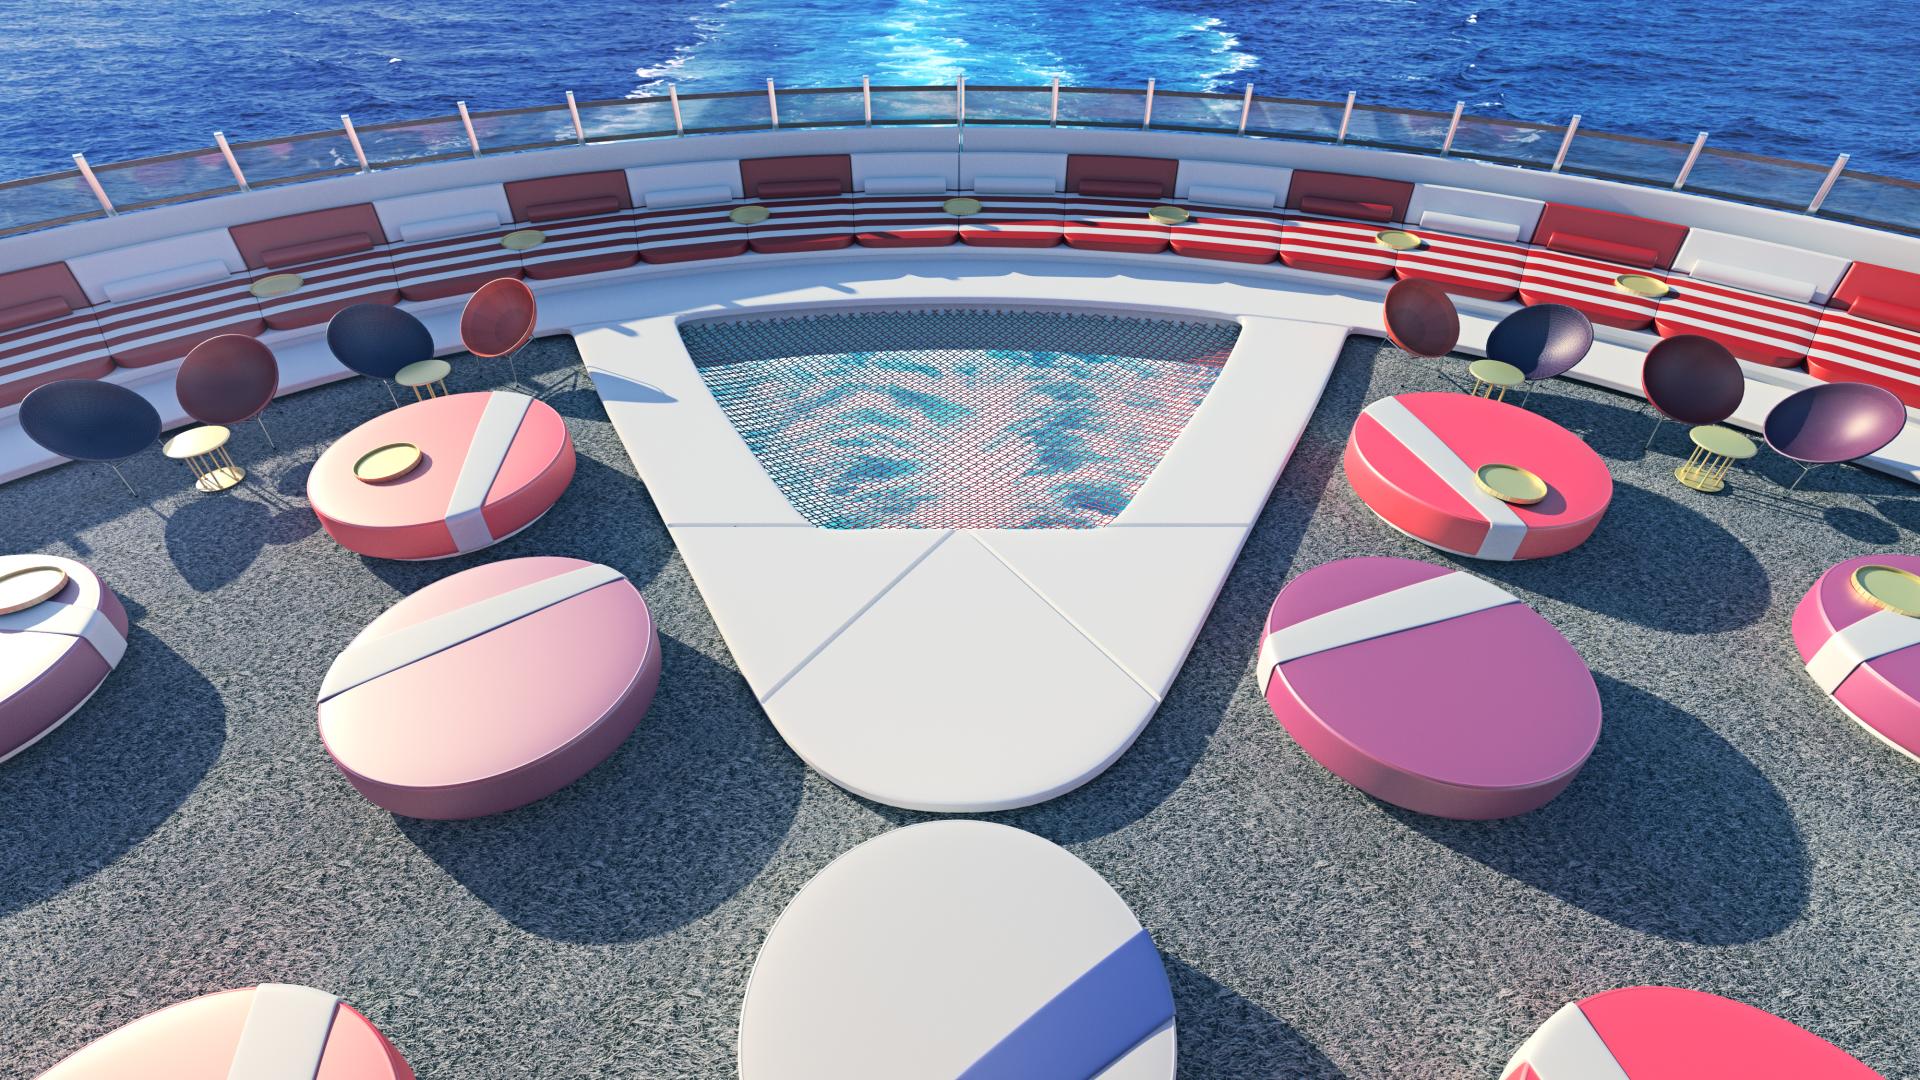 Virgin Voyages_Scarlet Lady_AthleticClub-catamaran-net_Concrete-Amsterdam